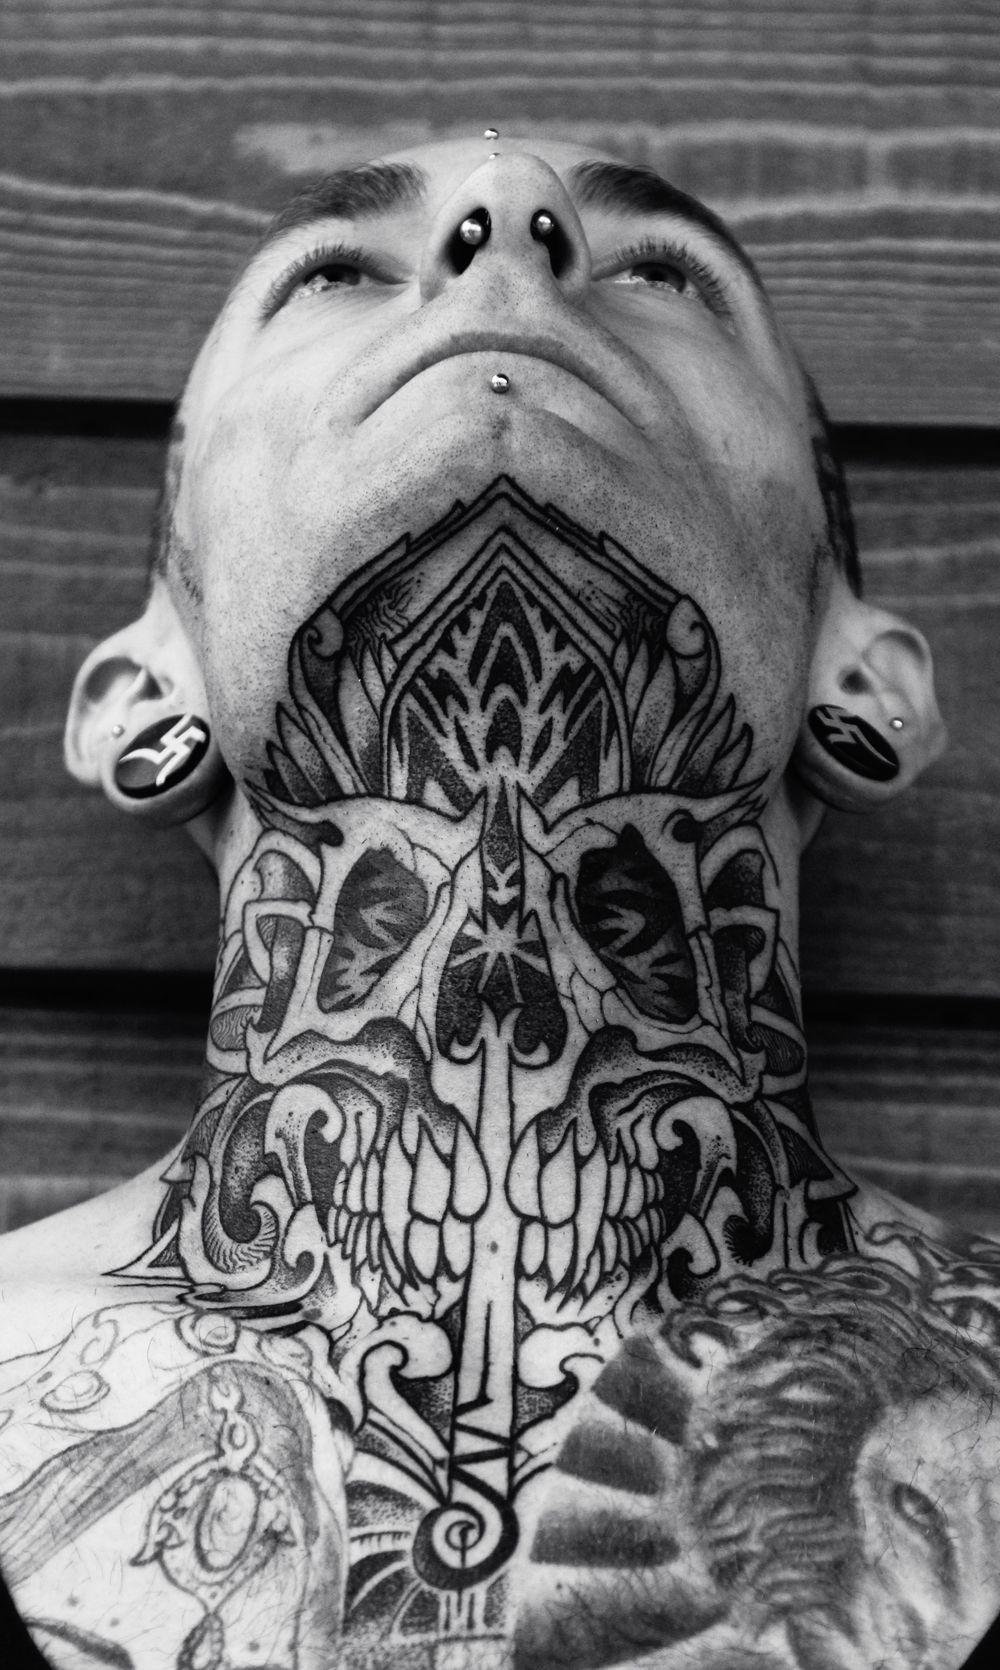 Skull Mandala neck piece Neck tattoo for guys, Tribal